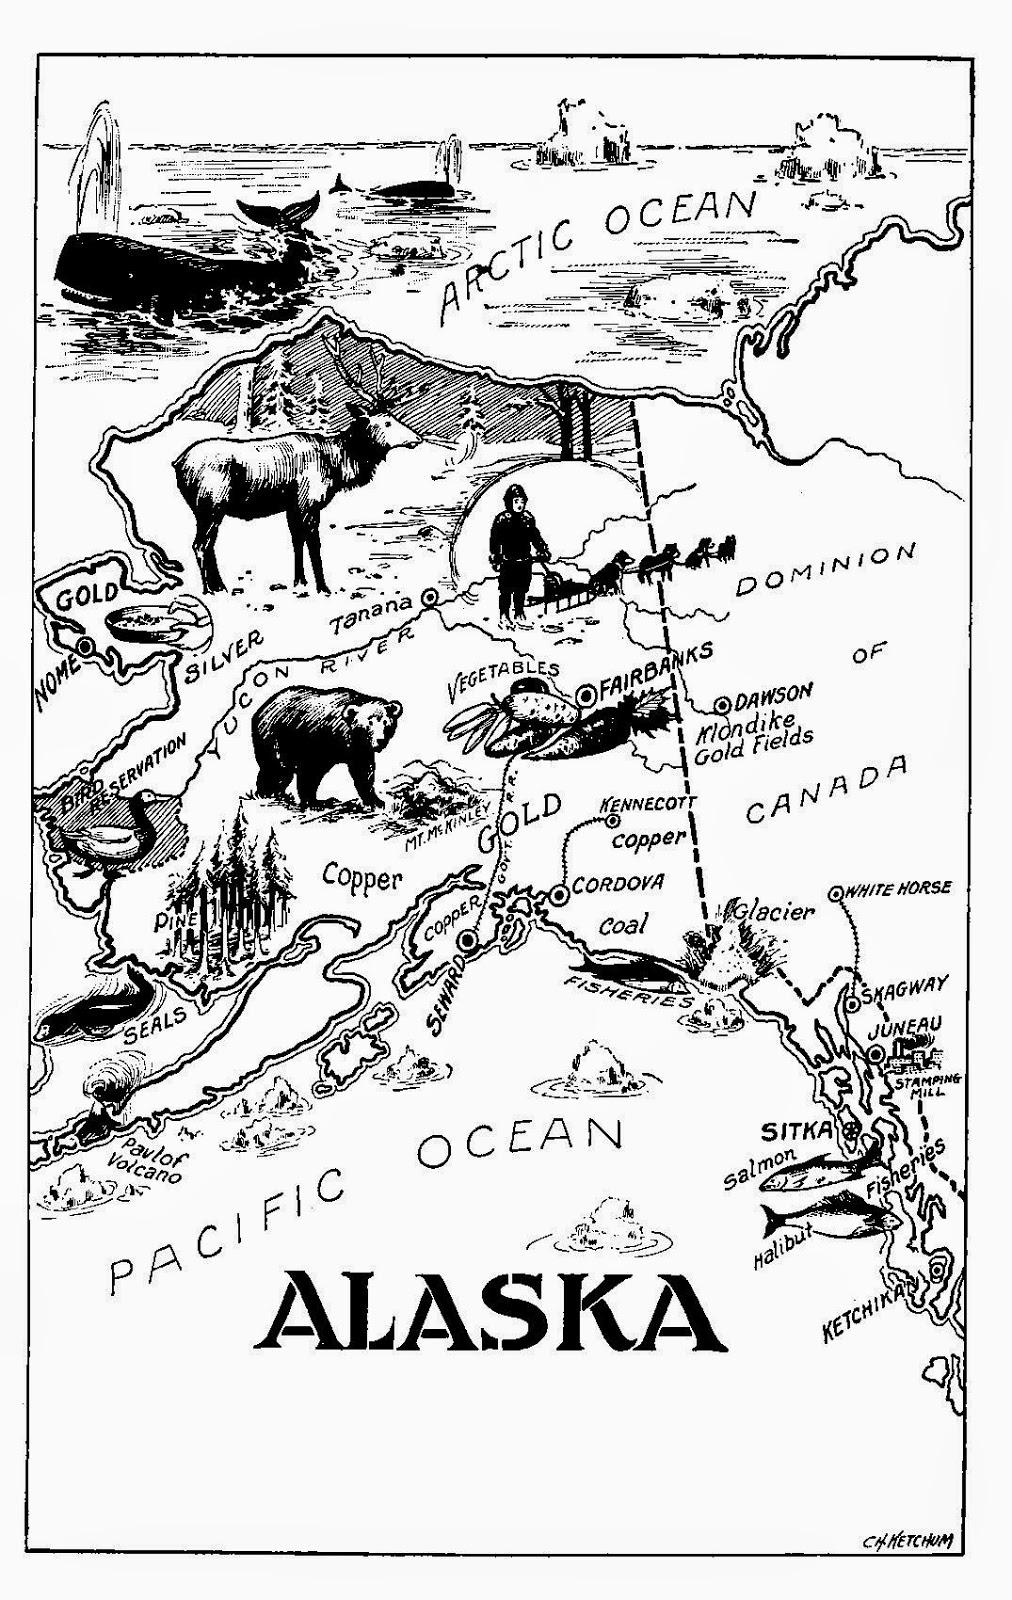 http://2.bp.blogspot.com/-7EbdpJzT9_Q/VDhkVFwwhvI/AAAAAAAA47s/A1_q001bO6k/s1600/AlaskaStateMapVintageTlcCreations.jpg